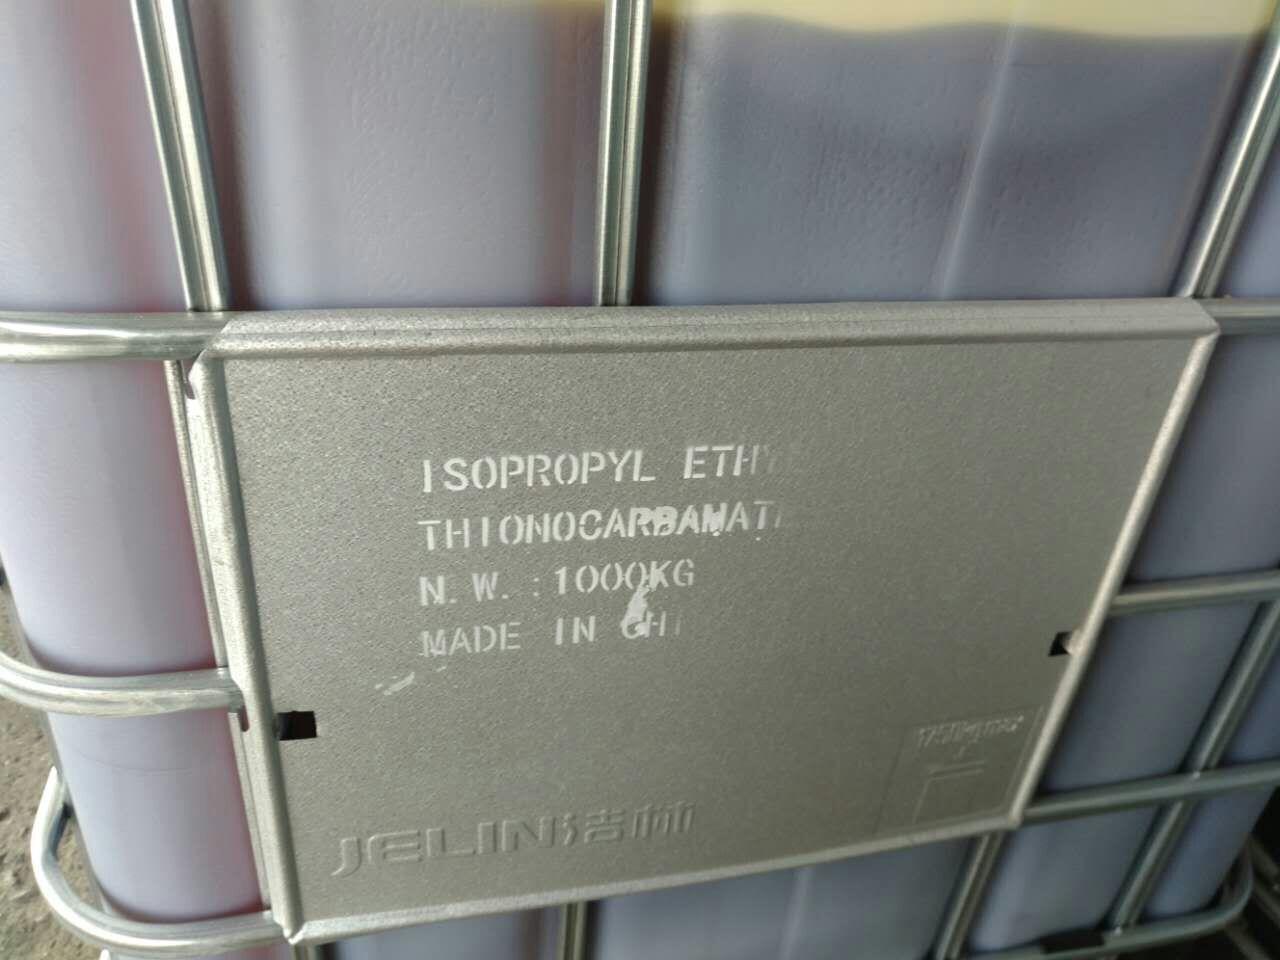 ISOPROPYL ETHYL THIONOCARBAMATE